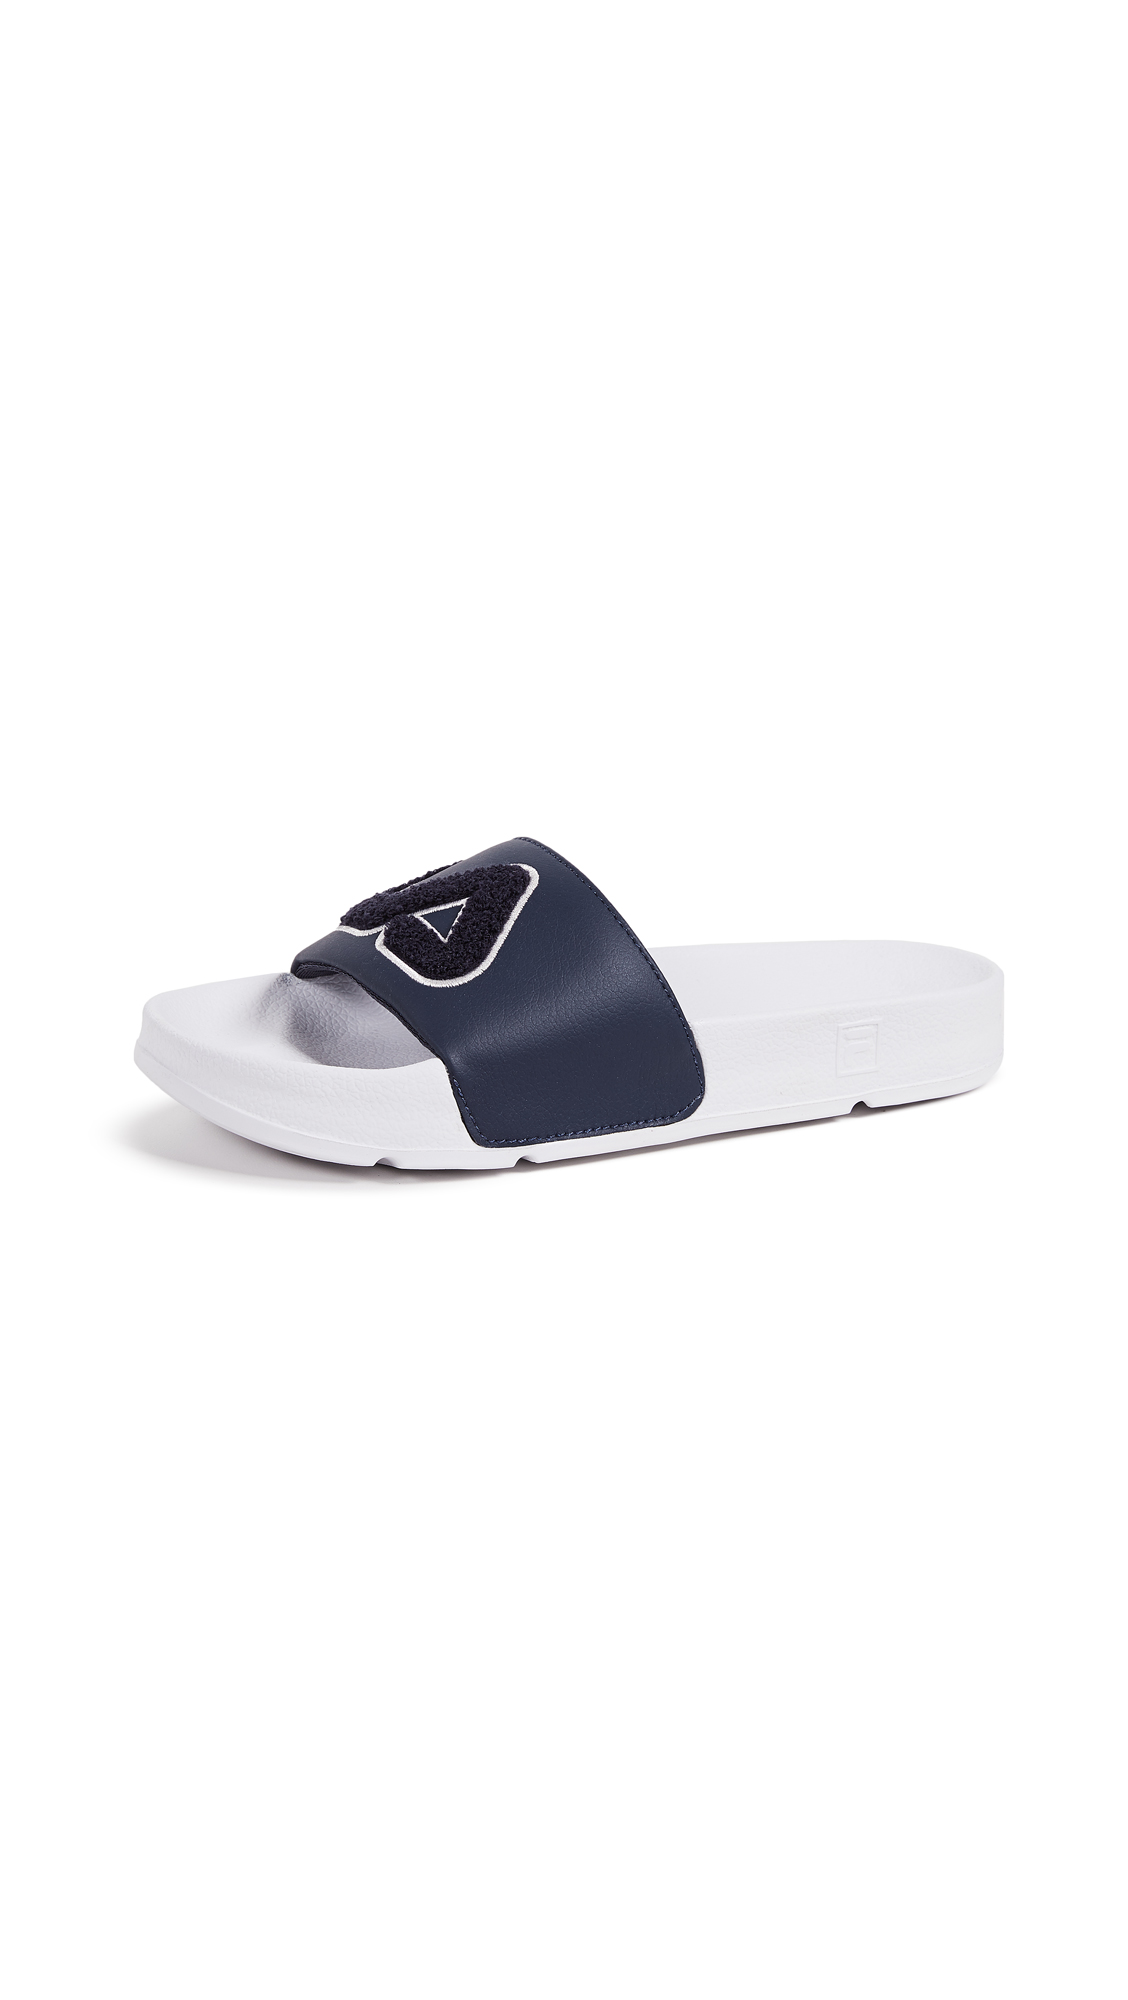 Fila Drifter Varsity Slides - Navy/White